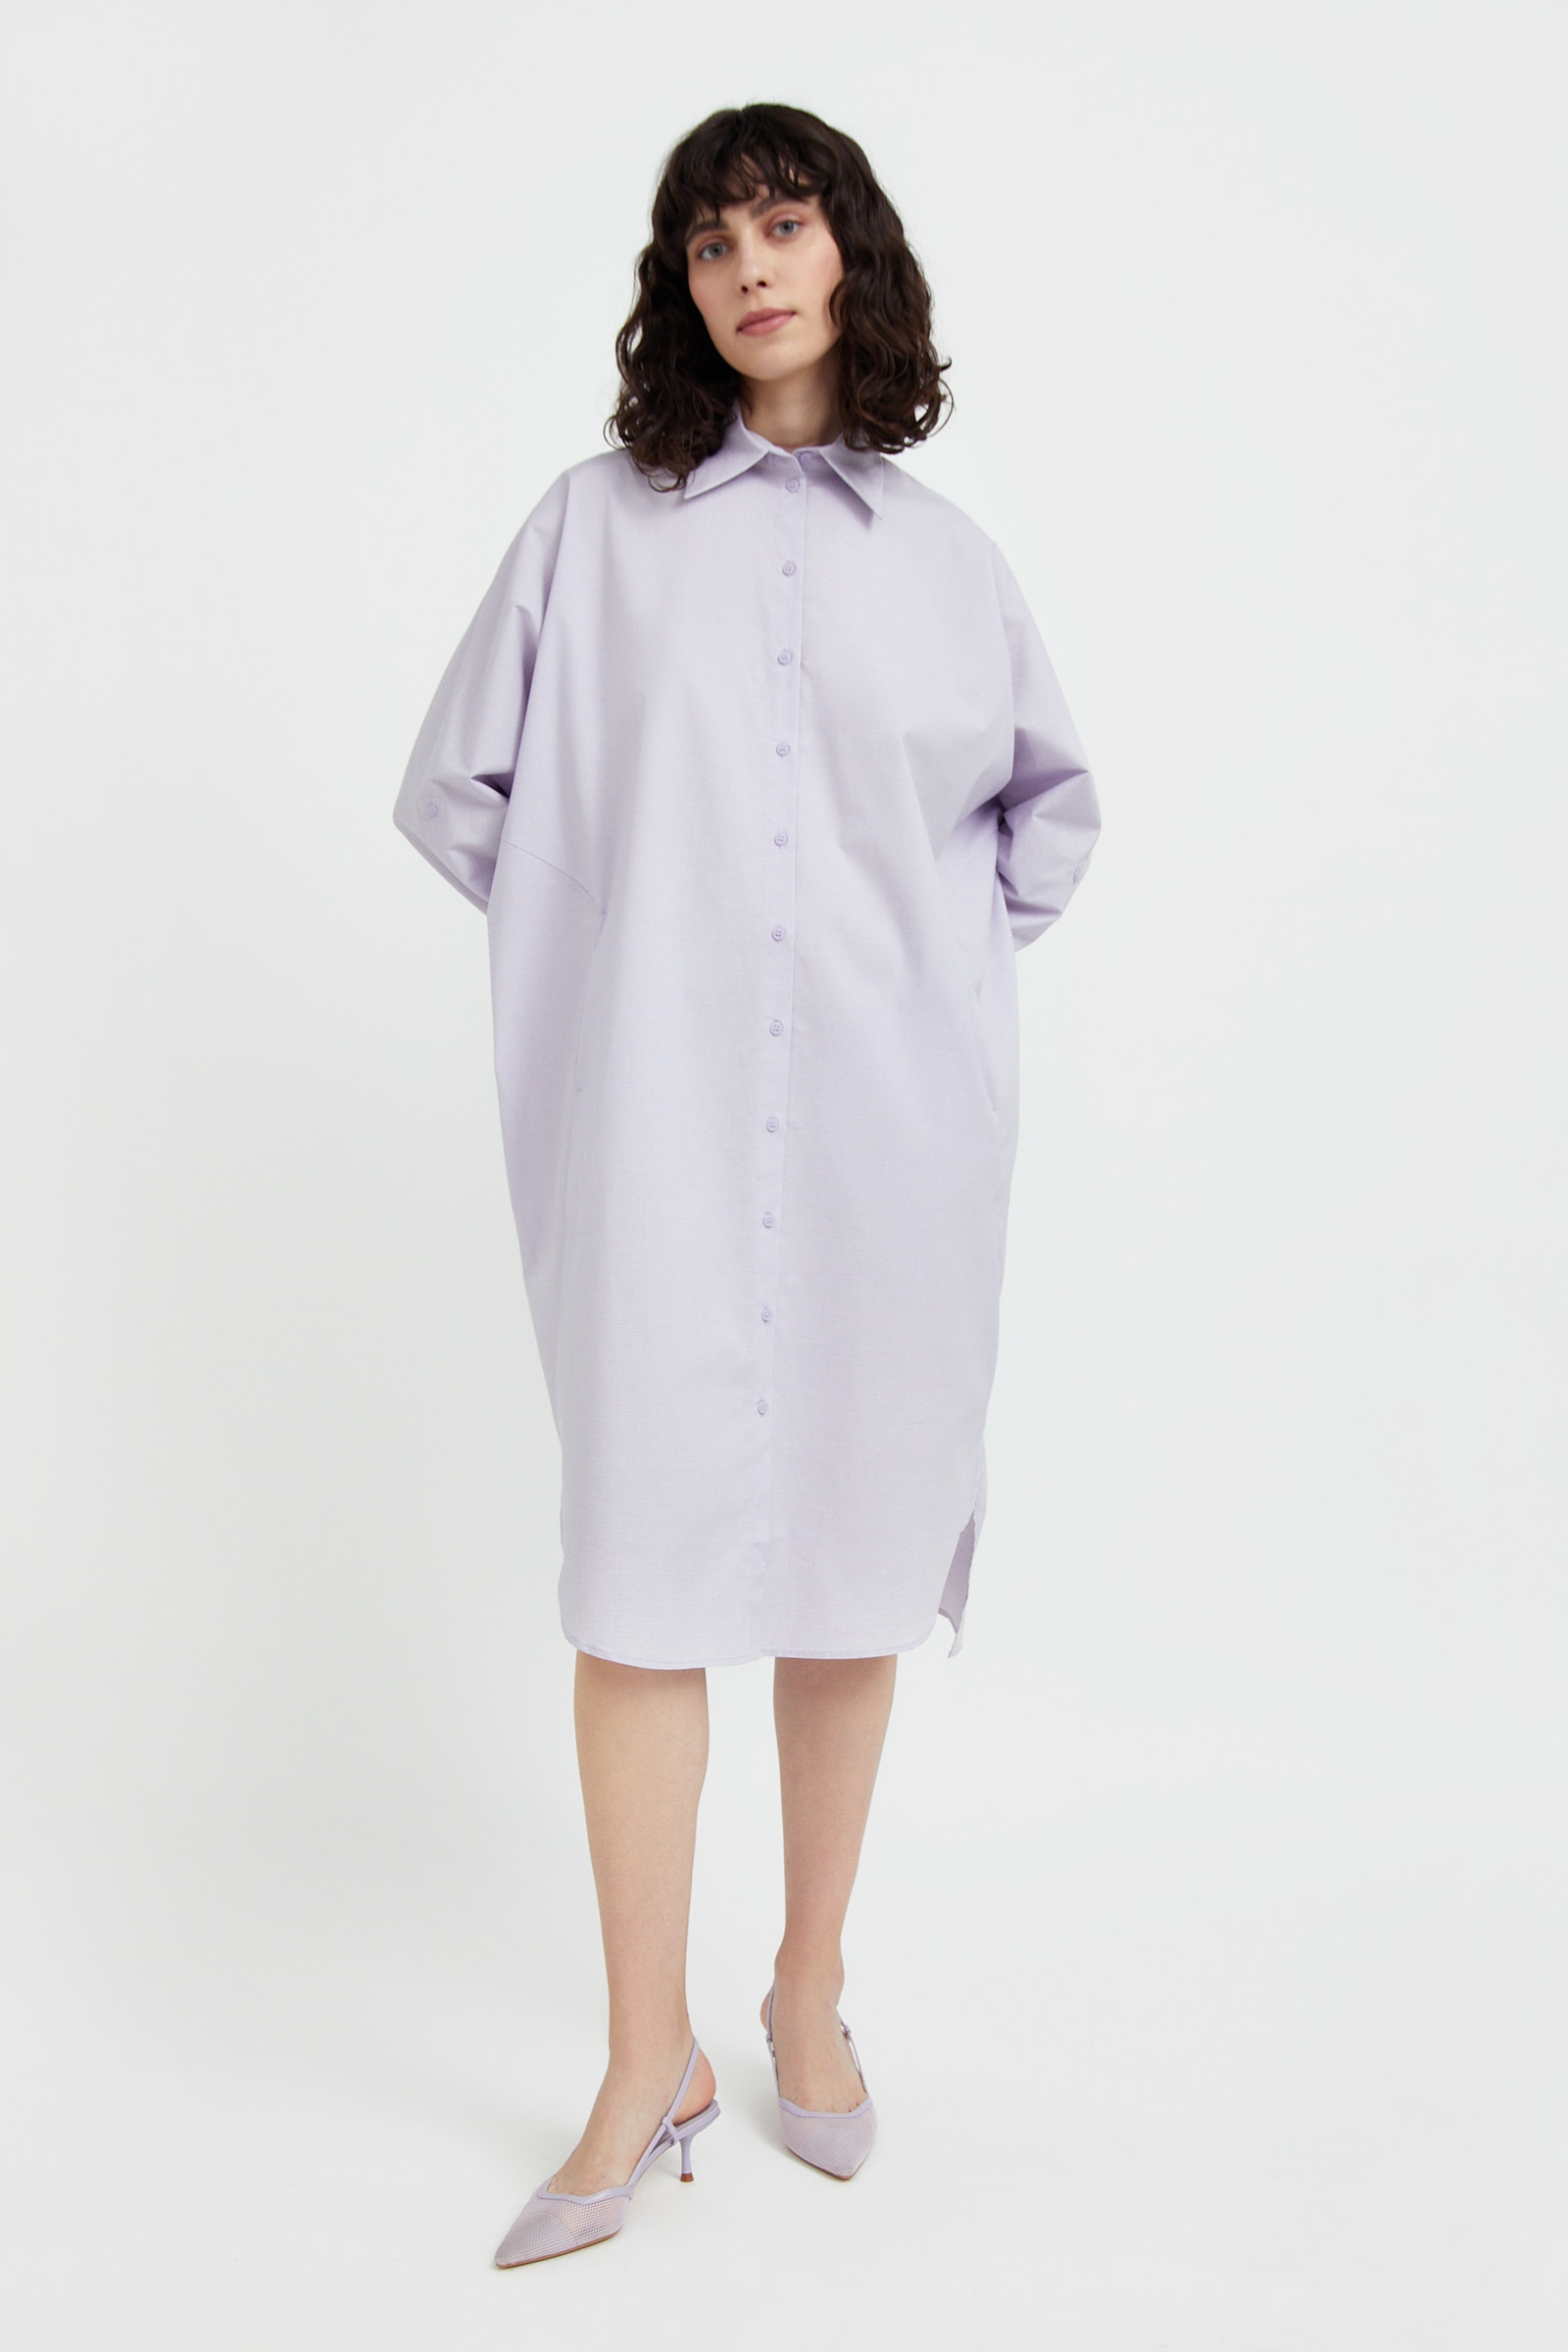 finn flare -  Jerseykleid, mit lockerem Schnitt